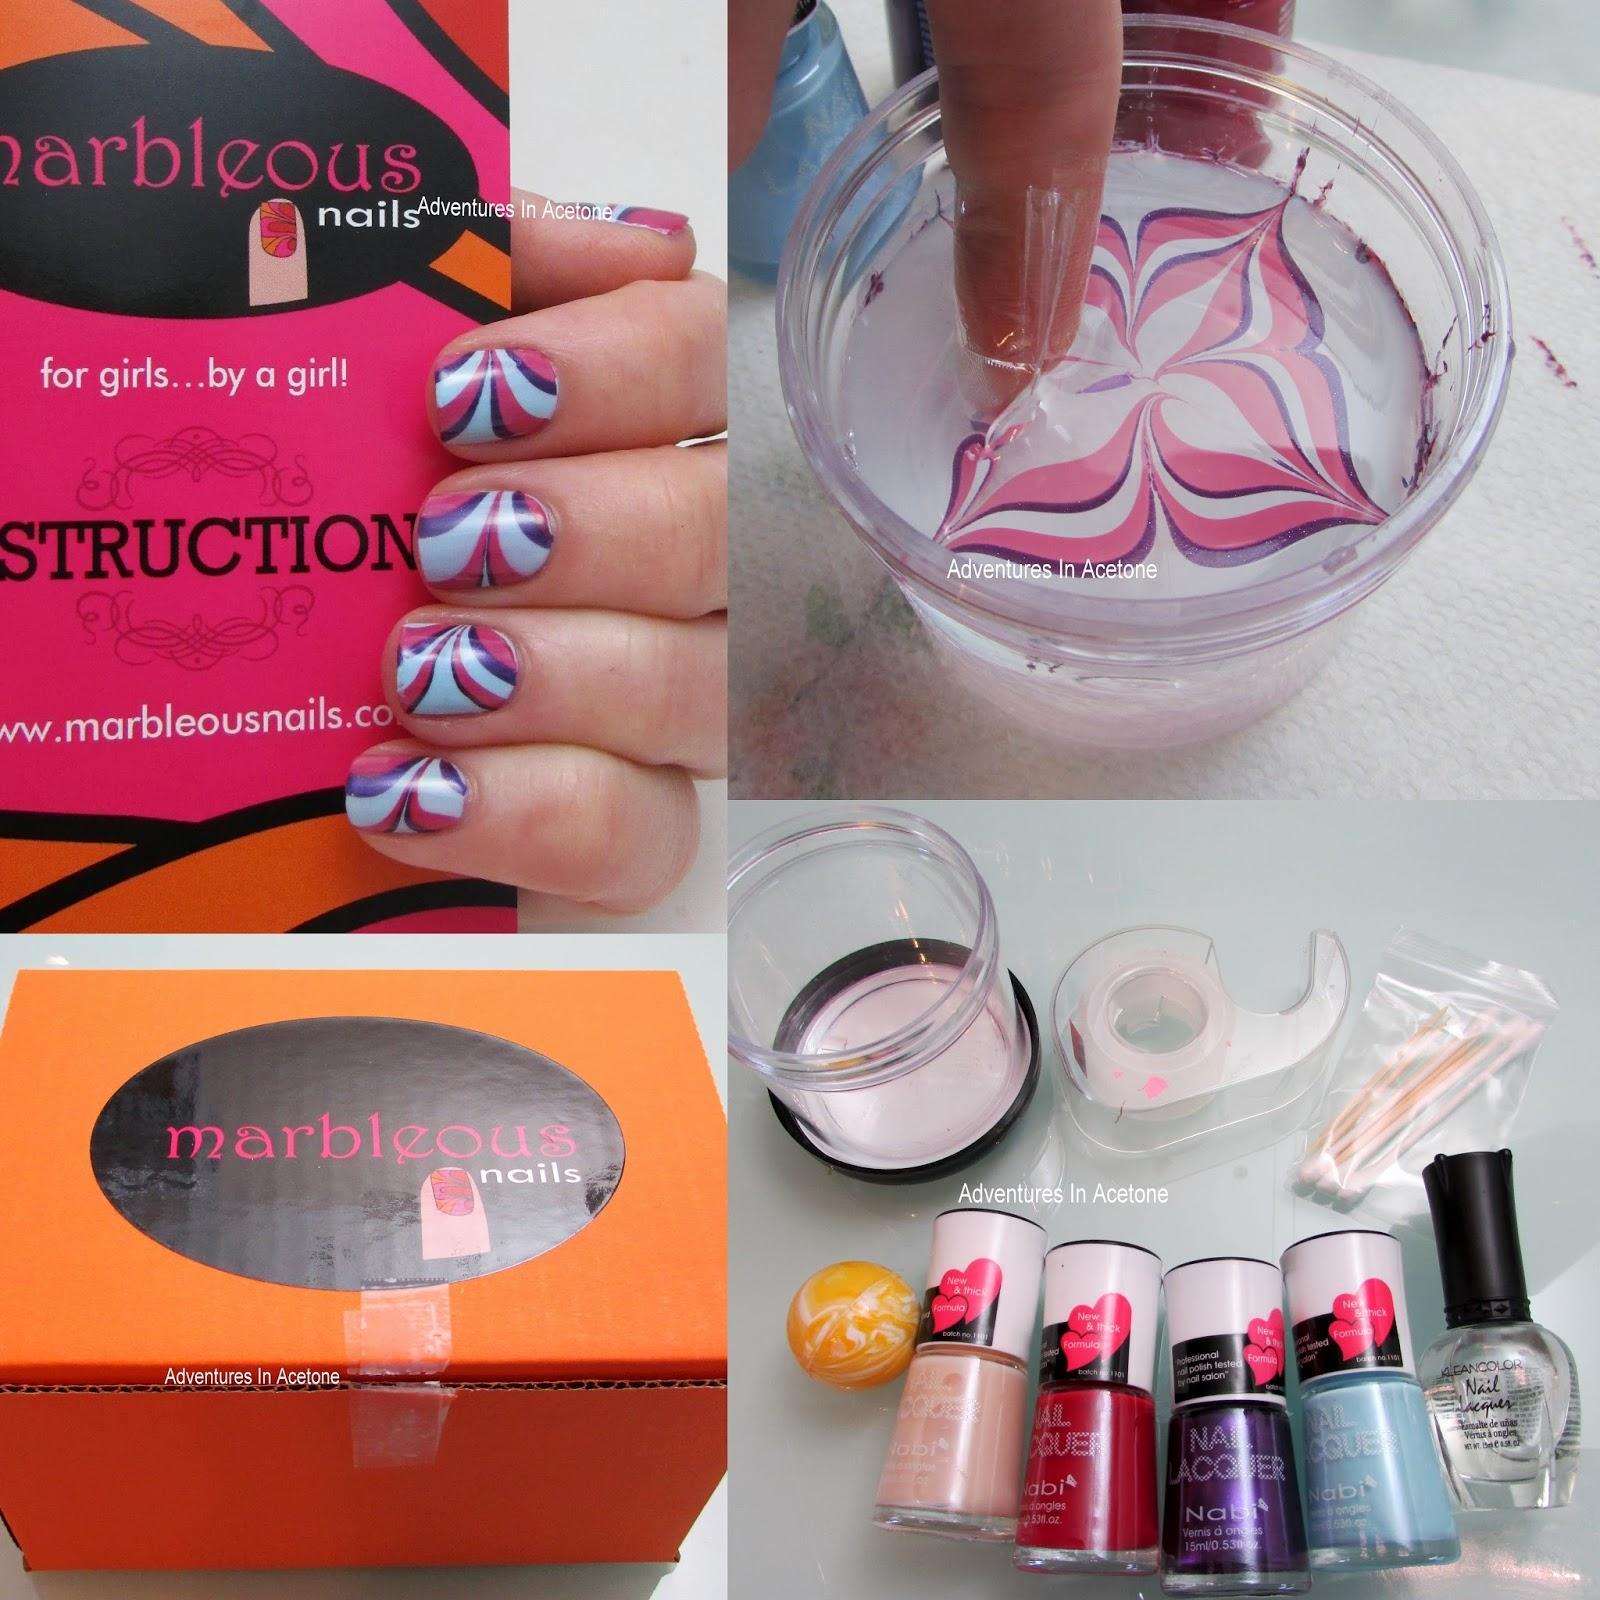 Enchanting Nail Marbling Kit Vignette - Nail Art Ideas - morihati.com